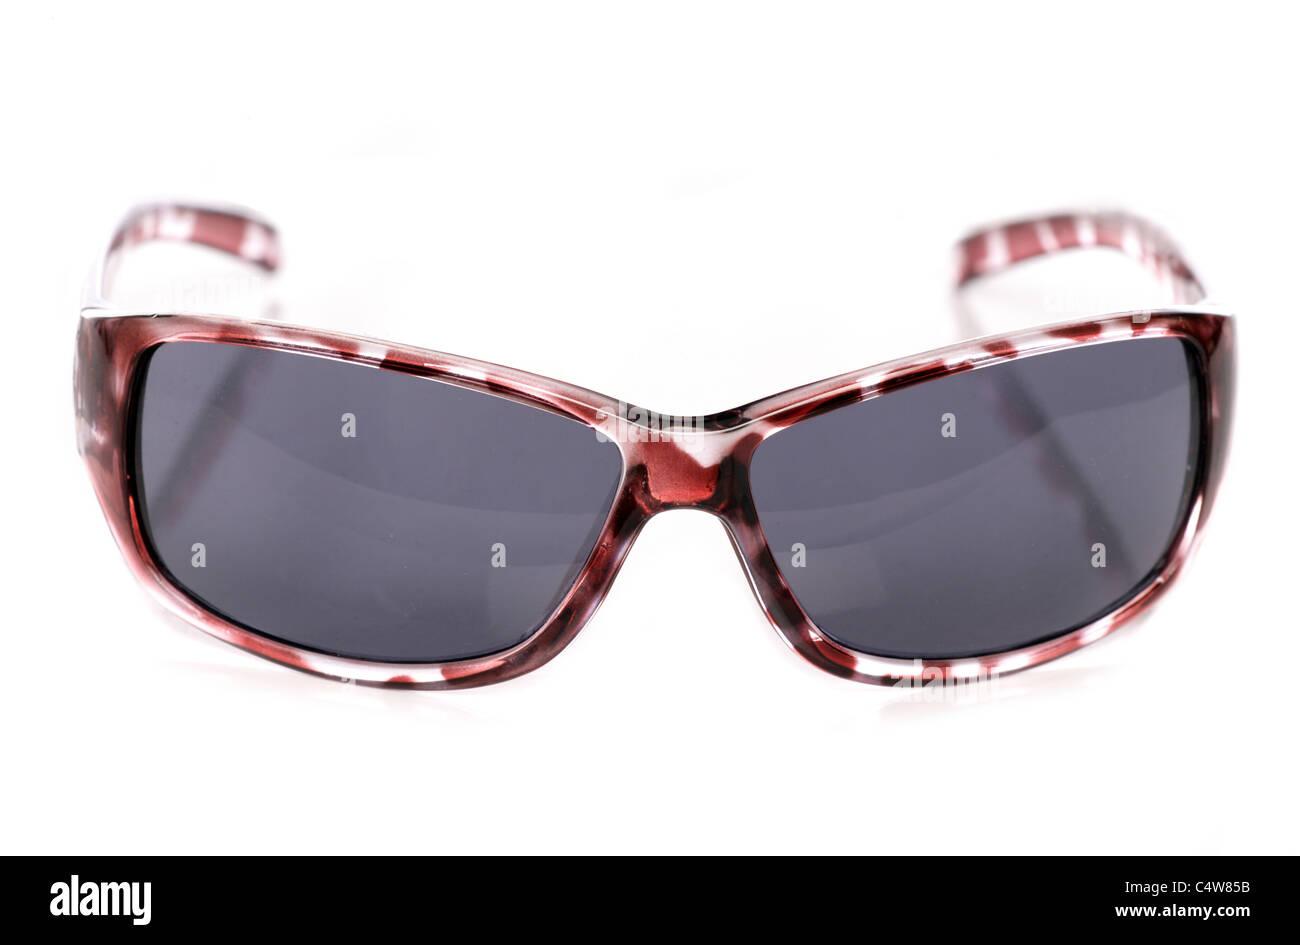 womens sunglasses isolated on white background Stock Photo